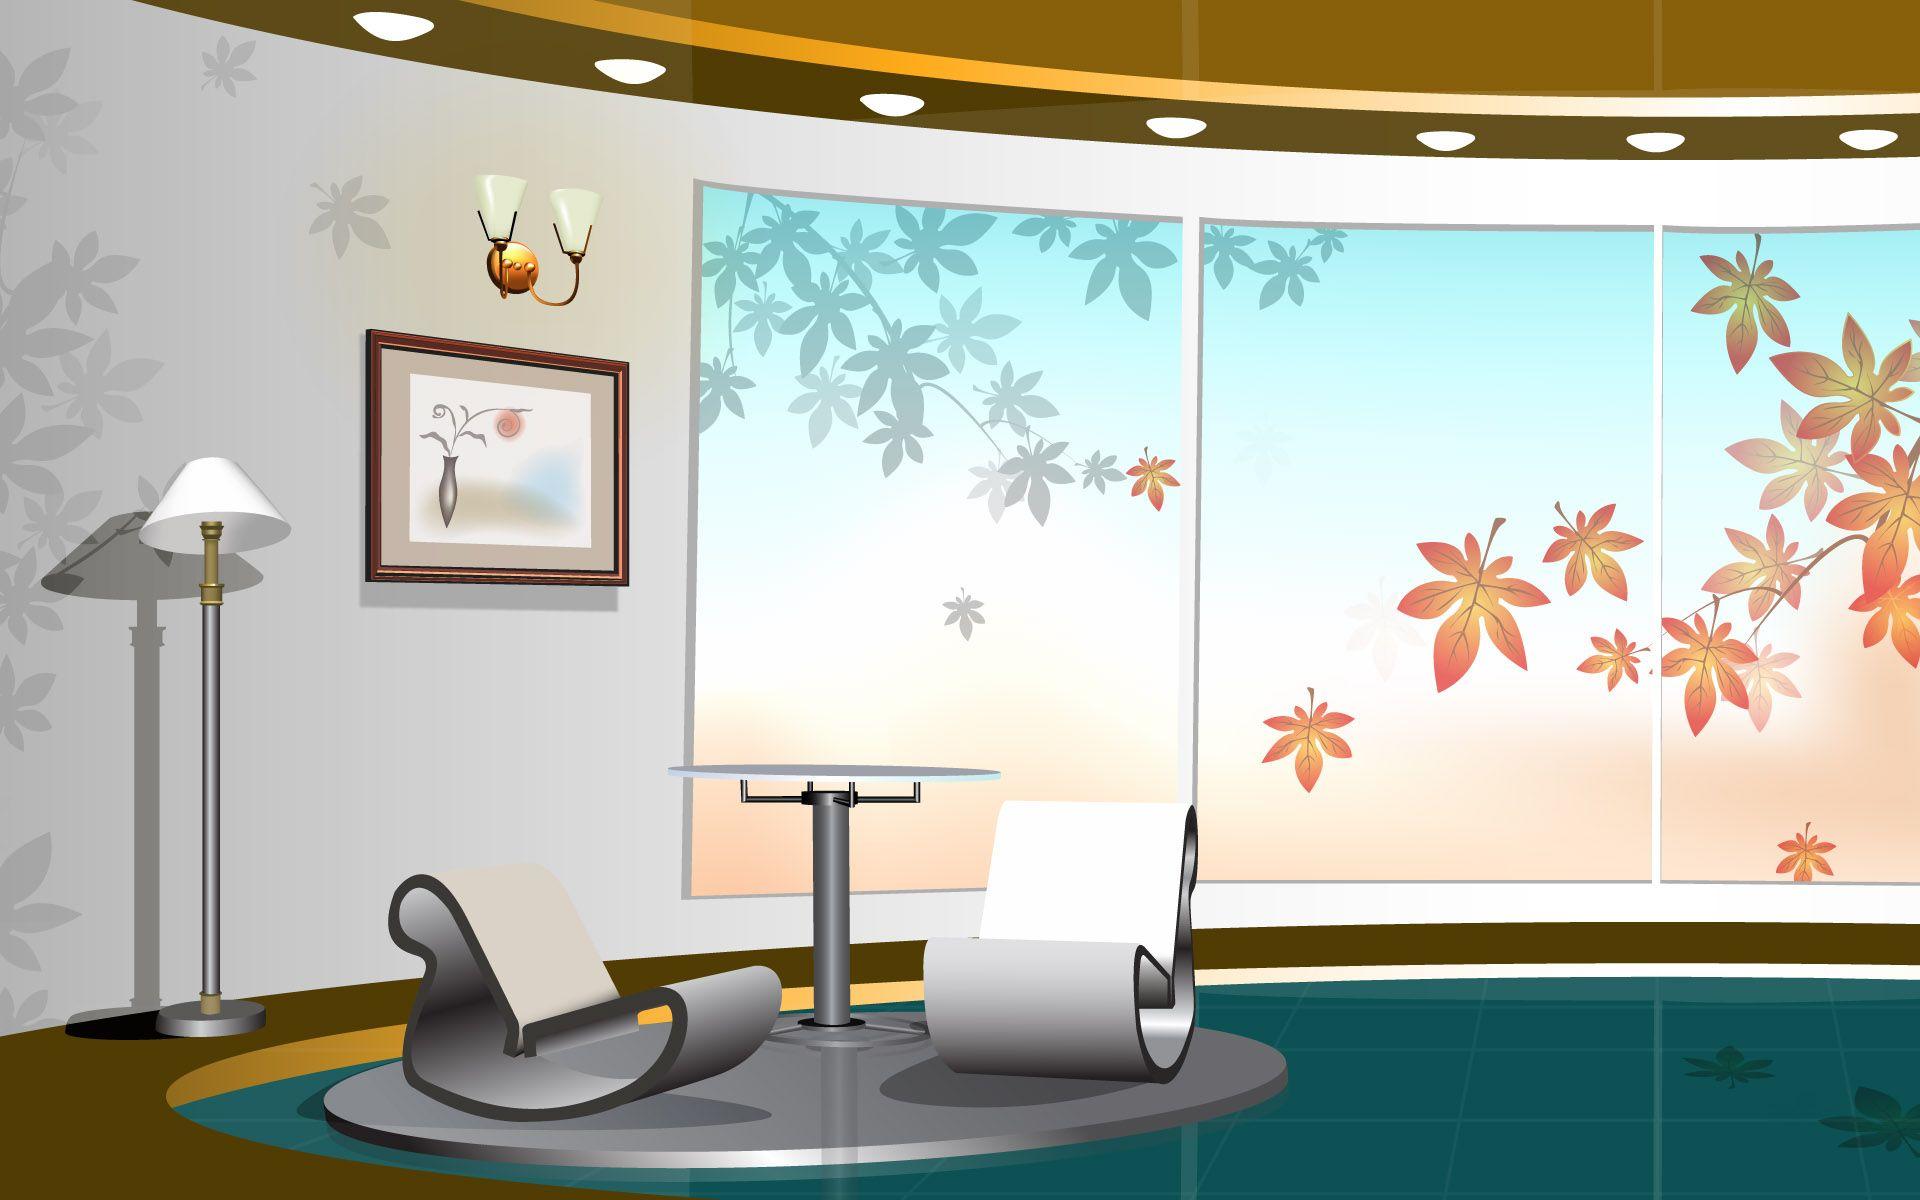 Art, design, wallpaper, interior, digital, albums, dubstep, album ...